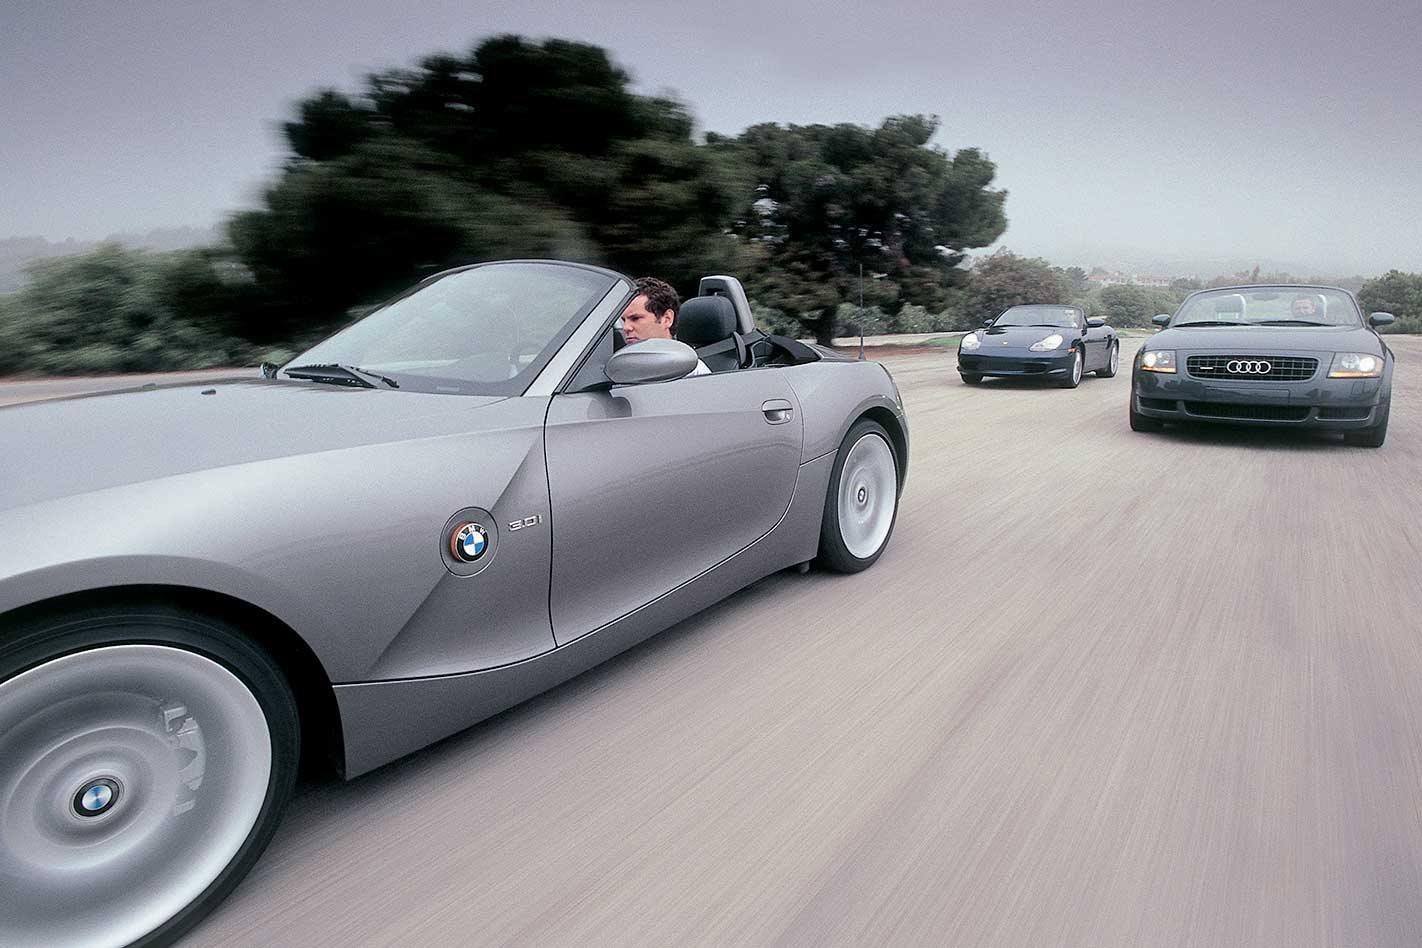 hight resolution of 2003 audi tt roadster vs bmw z4 vs porsche boxster comparison review classic motor